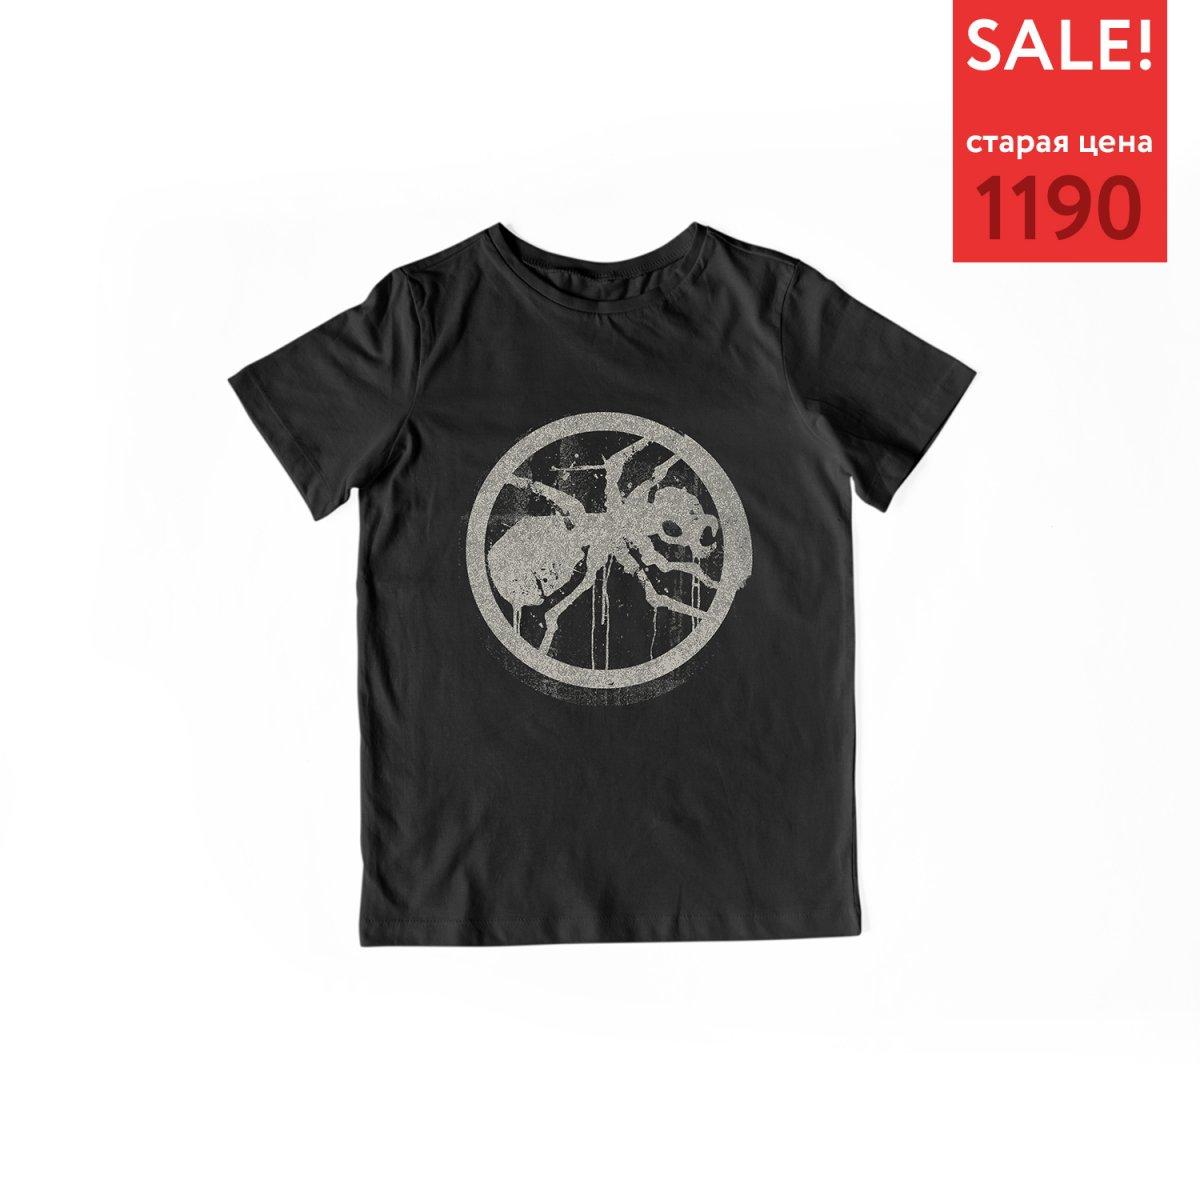 Детская футболка «The Prodigy. Distressed Ant»